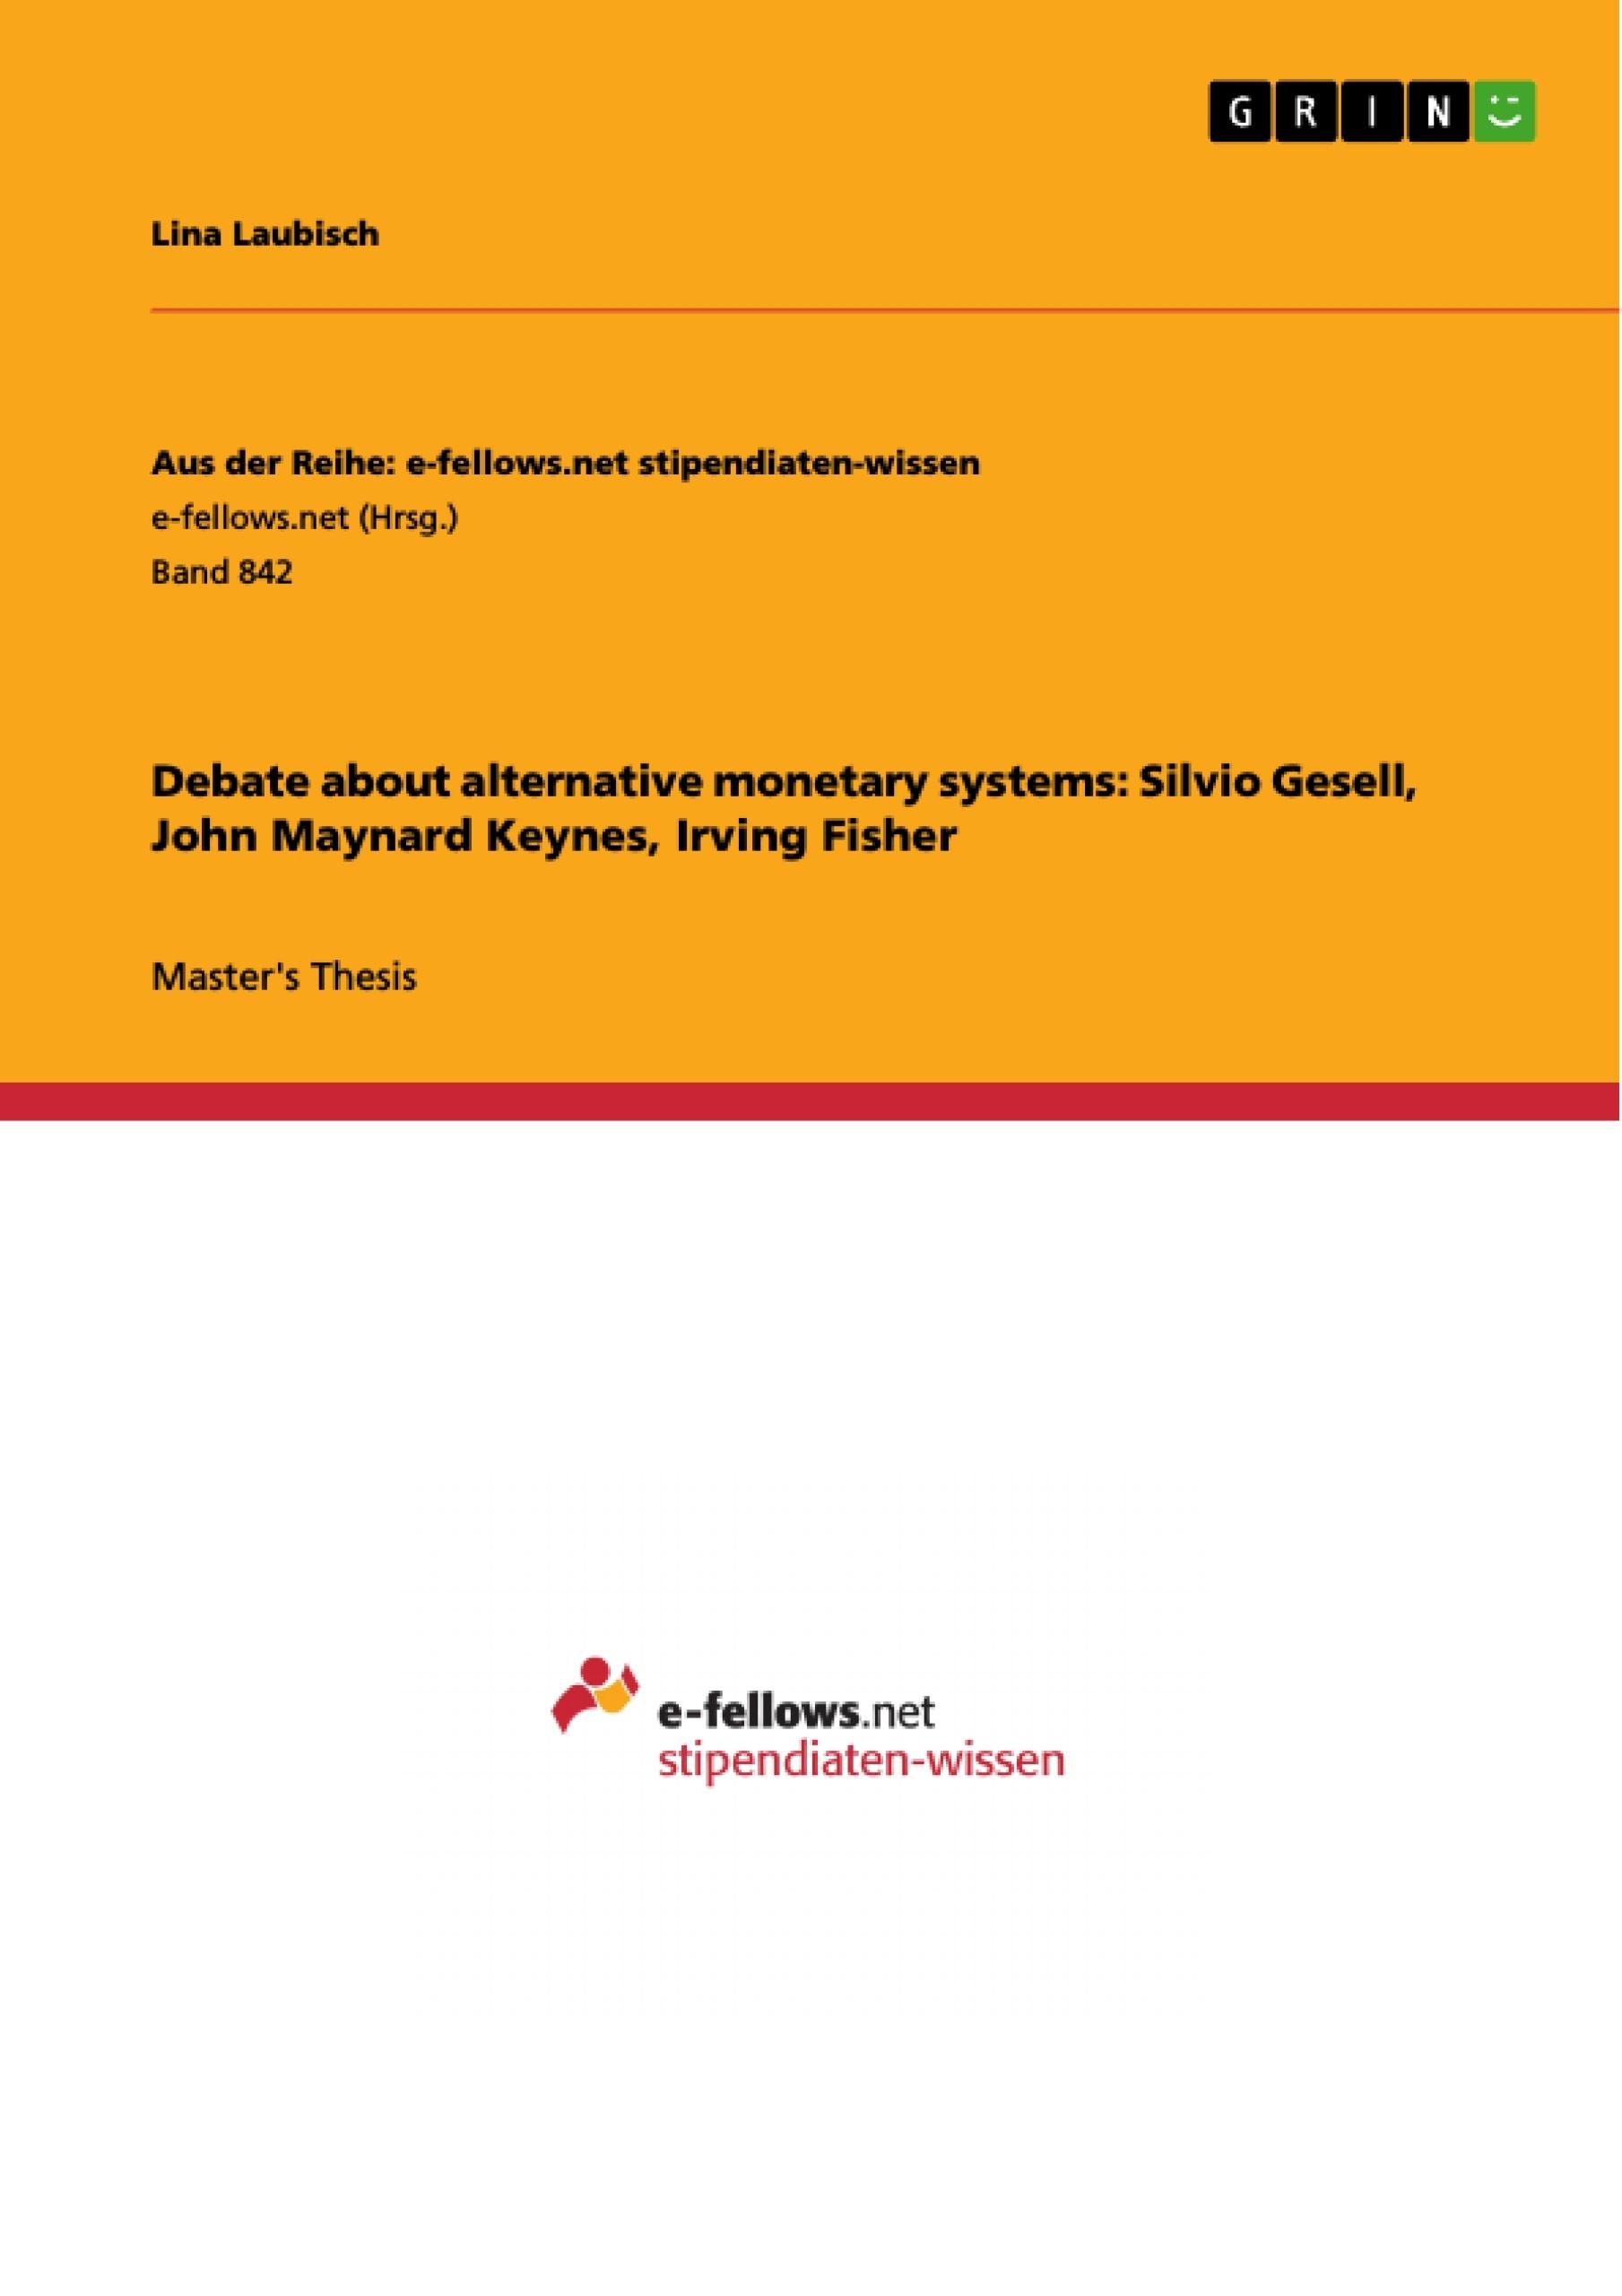 Title: Debate about alternative monetary systems: Silvio Gesell, John Maynard Keynes, Irving Fisher